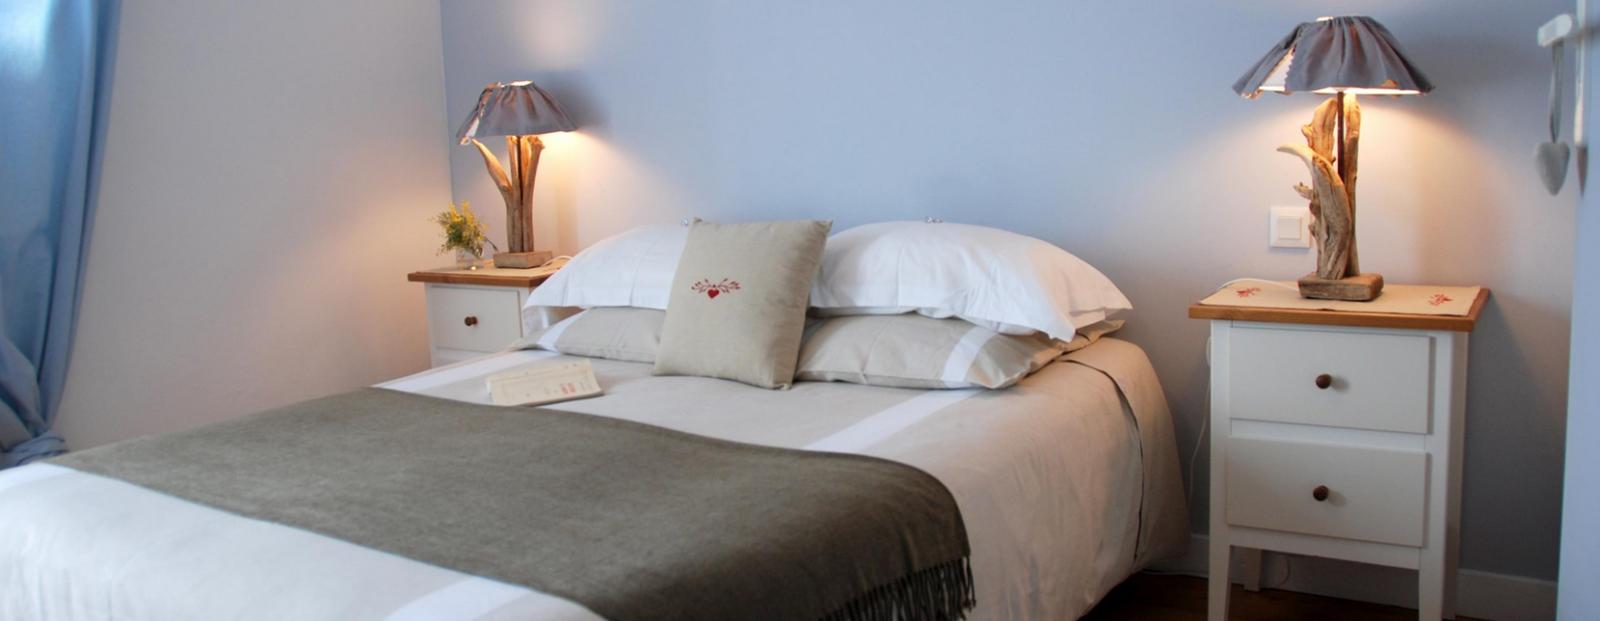 Hotel_Pavilon_Bleu (2)